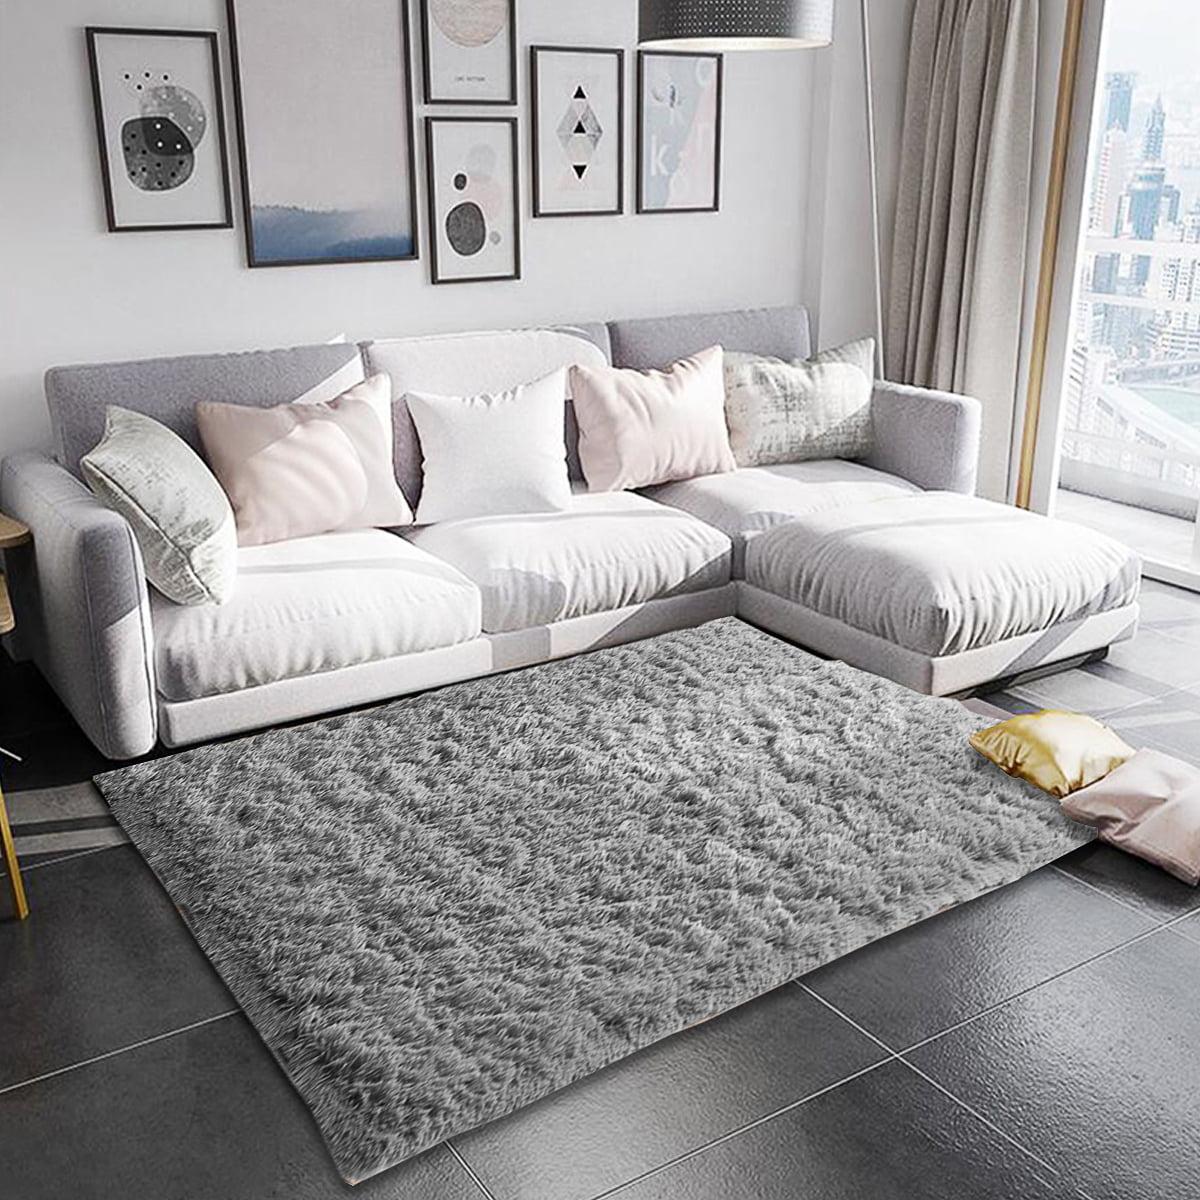 Luxury Large Rectangular Wool Shaggy Carpet Soft Breathable Fluffy Plush Carpet Floor Rug For Office Home Room Decor Camel Gray Purple Walmart Com Walmart Com